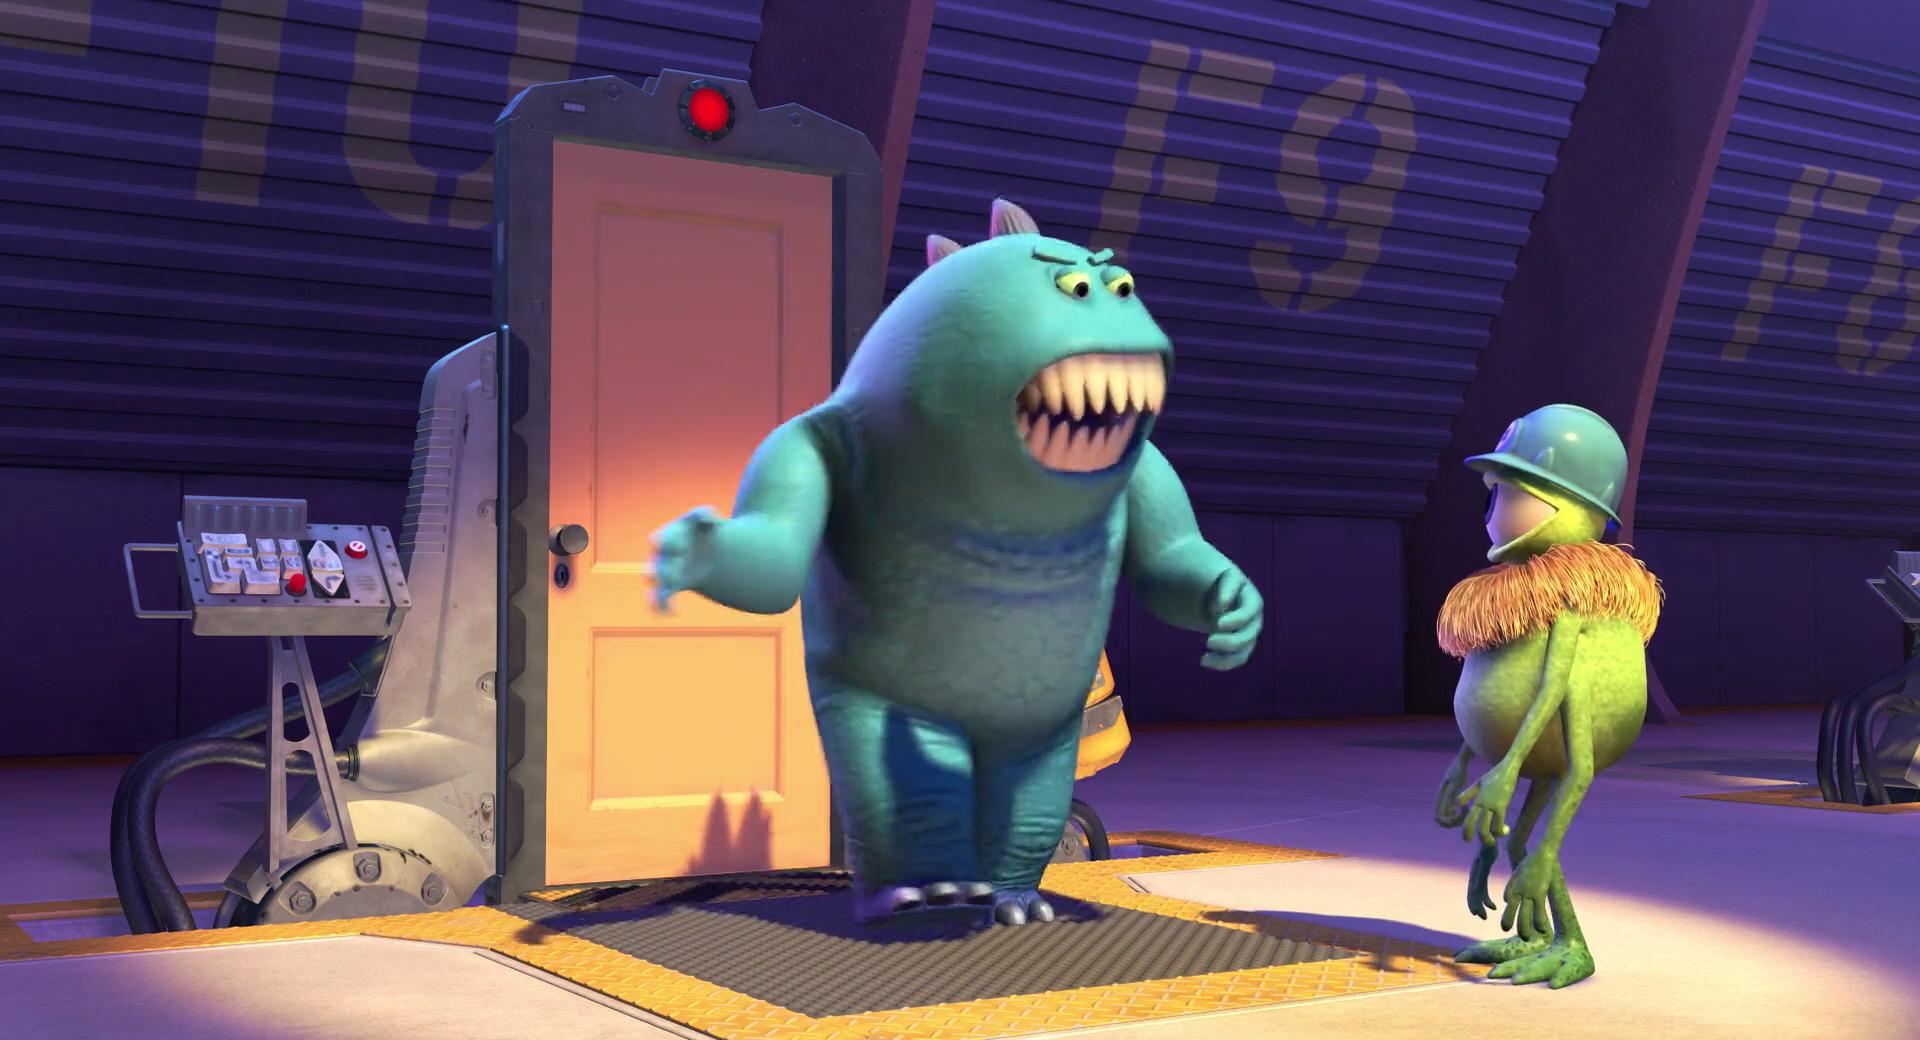 bob peterson personnage dans monstres cie pixar planet fr. Black Bedroom Furniture Sets. Home Design Ideas